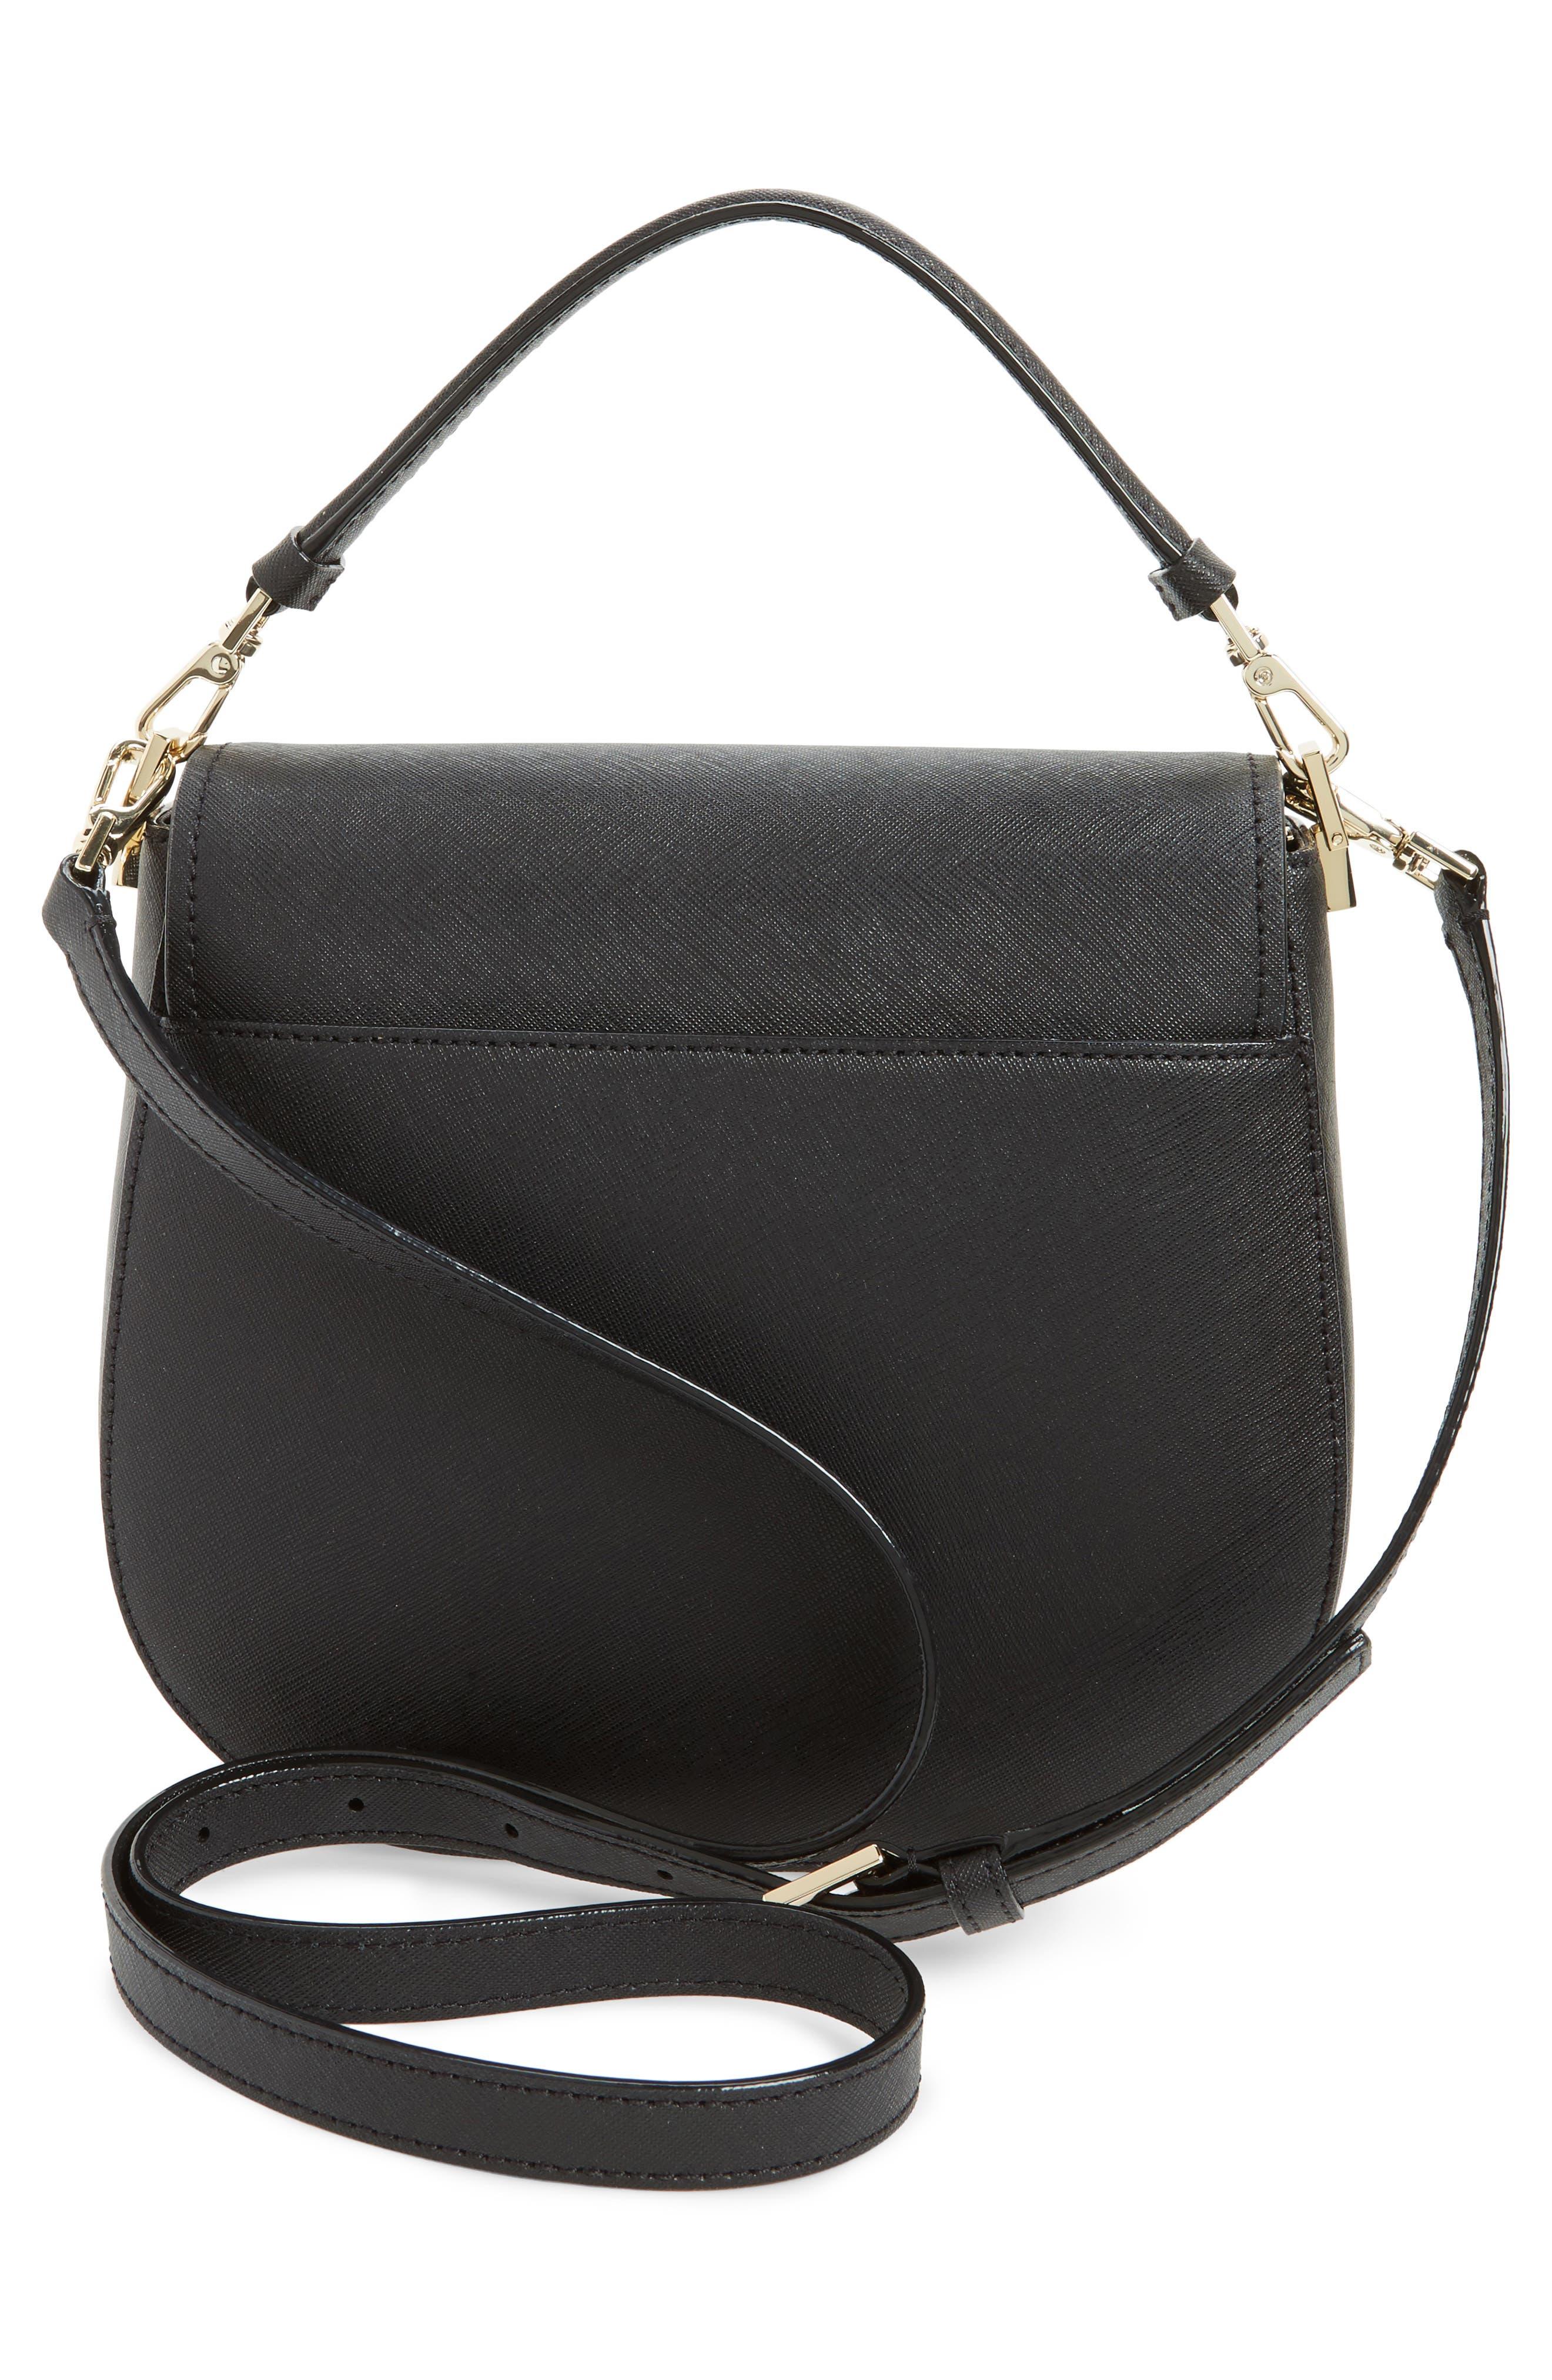 make it mine - byrdie leather saddle bag,                             Alternate thumbnail 2, color,                             Black